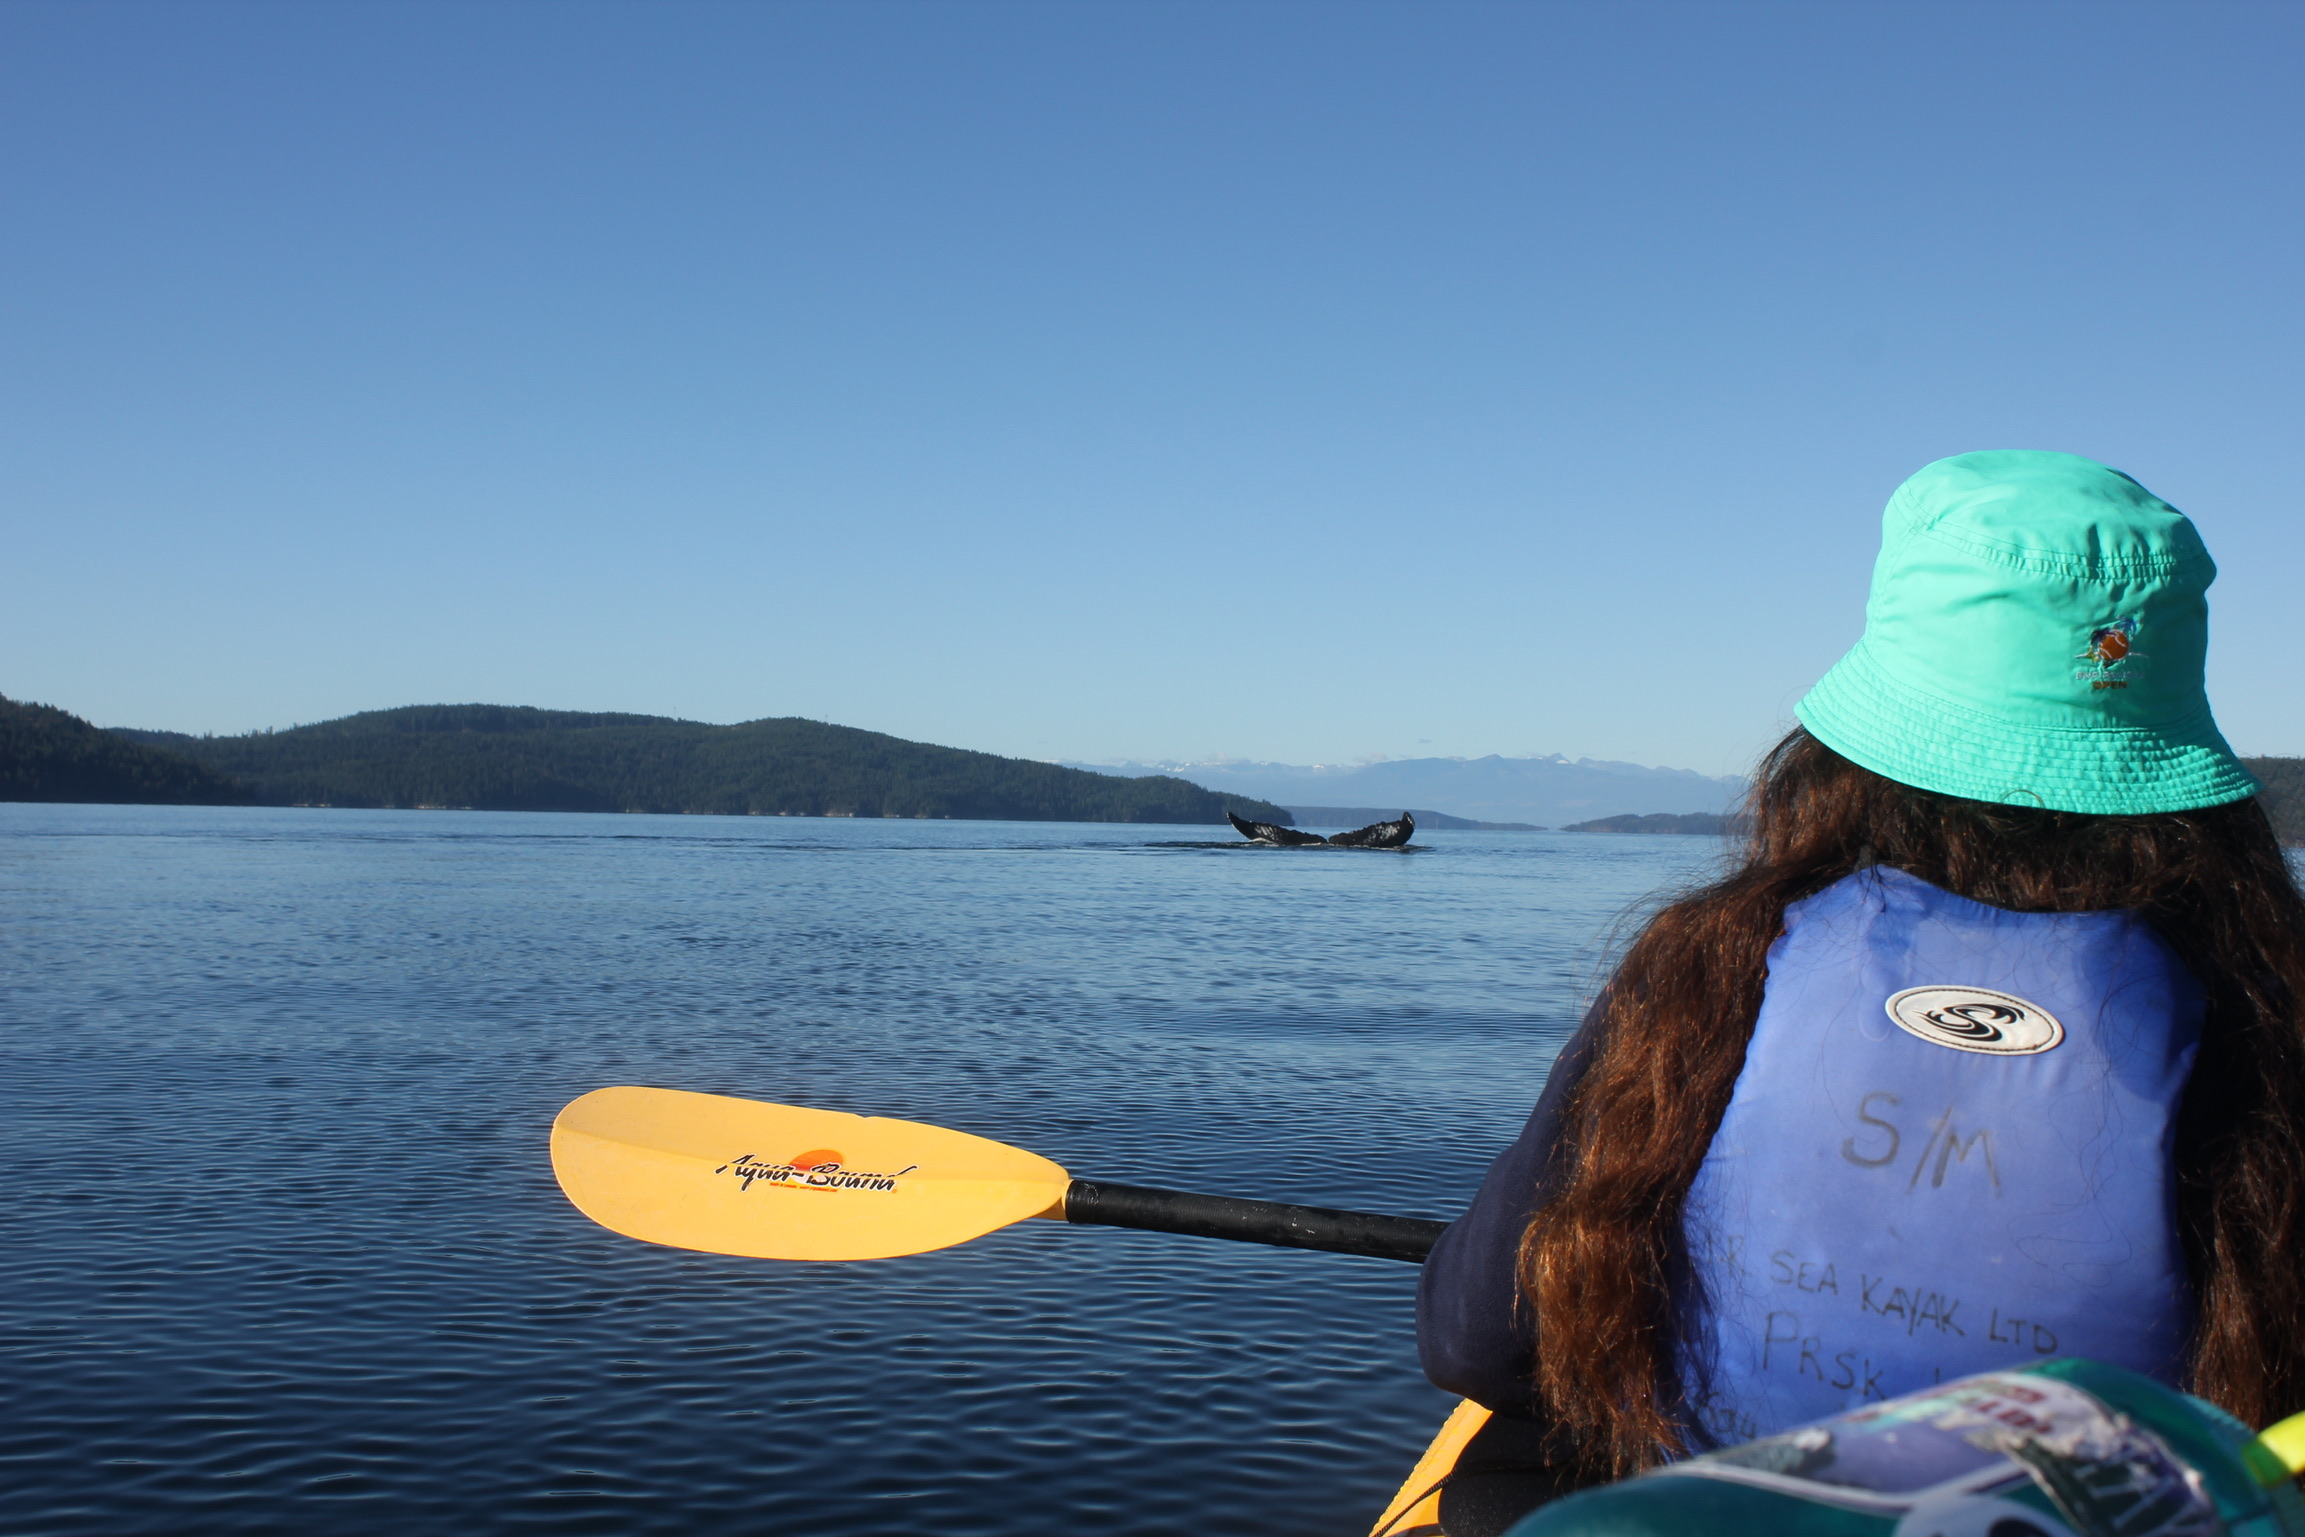 Little kayak meets big humpback whales.